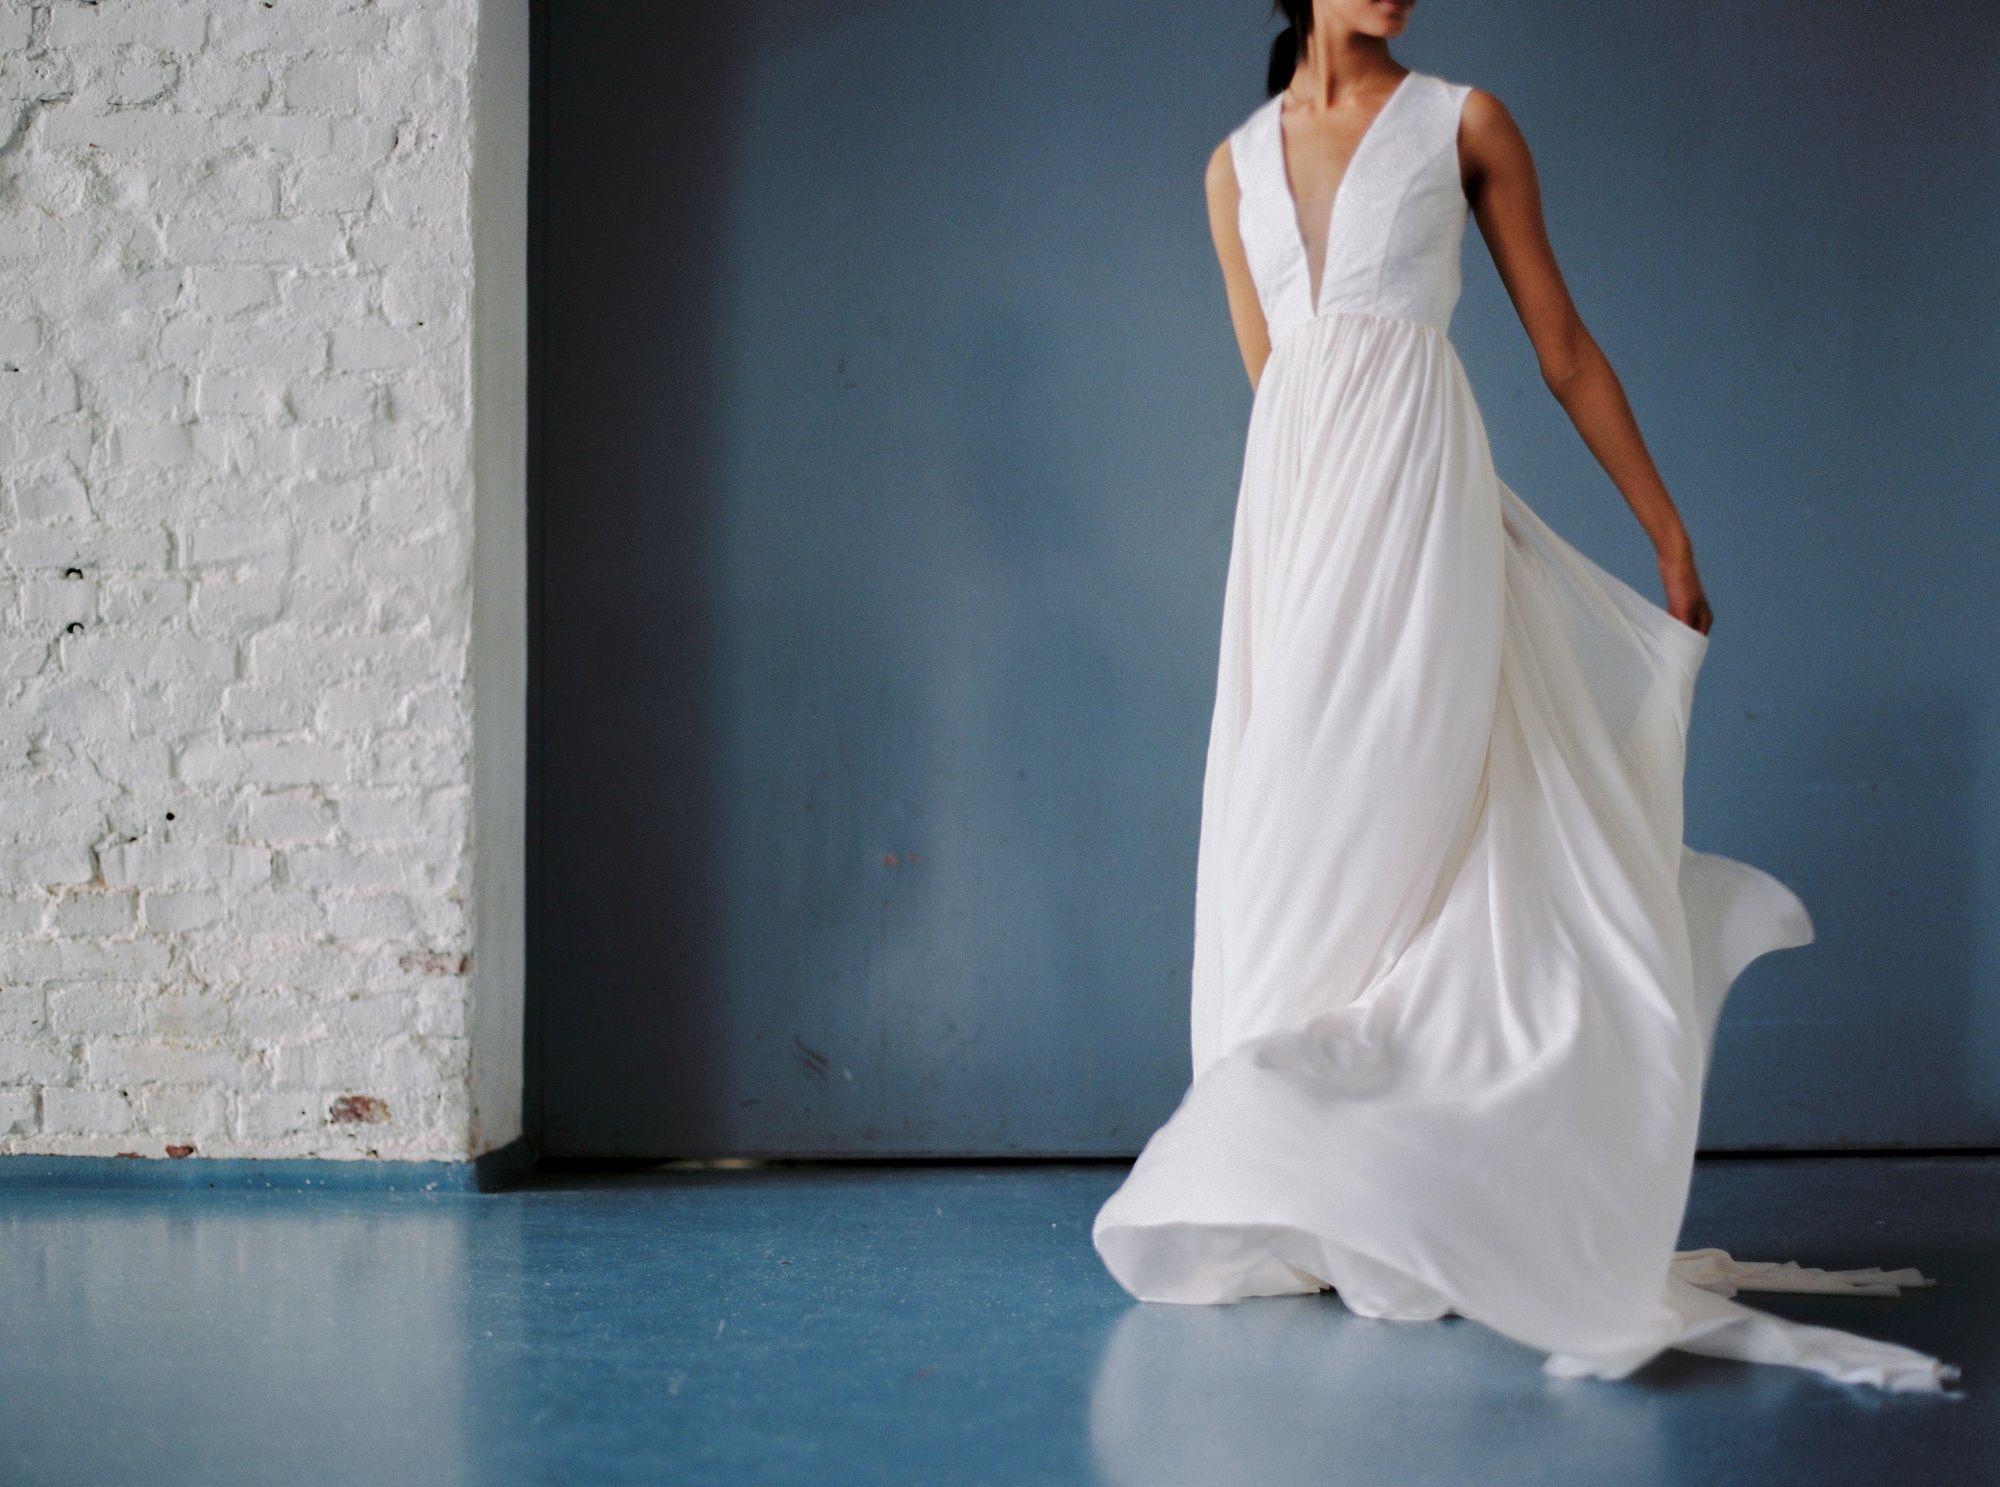 katja-scherle-festtagsfotografien_berlin-hamburg-filmweddingphotographer-hochzeitsfotograf-analog-minimalistic-wedding_0040